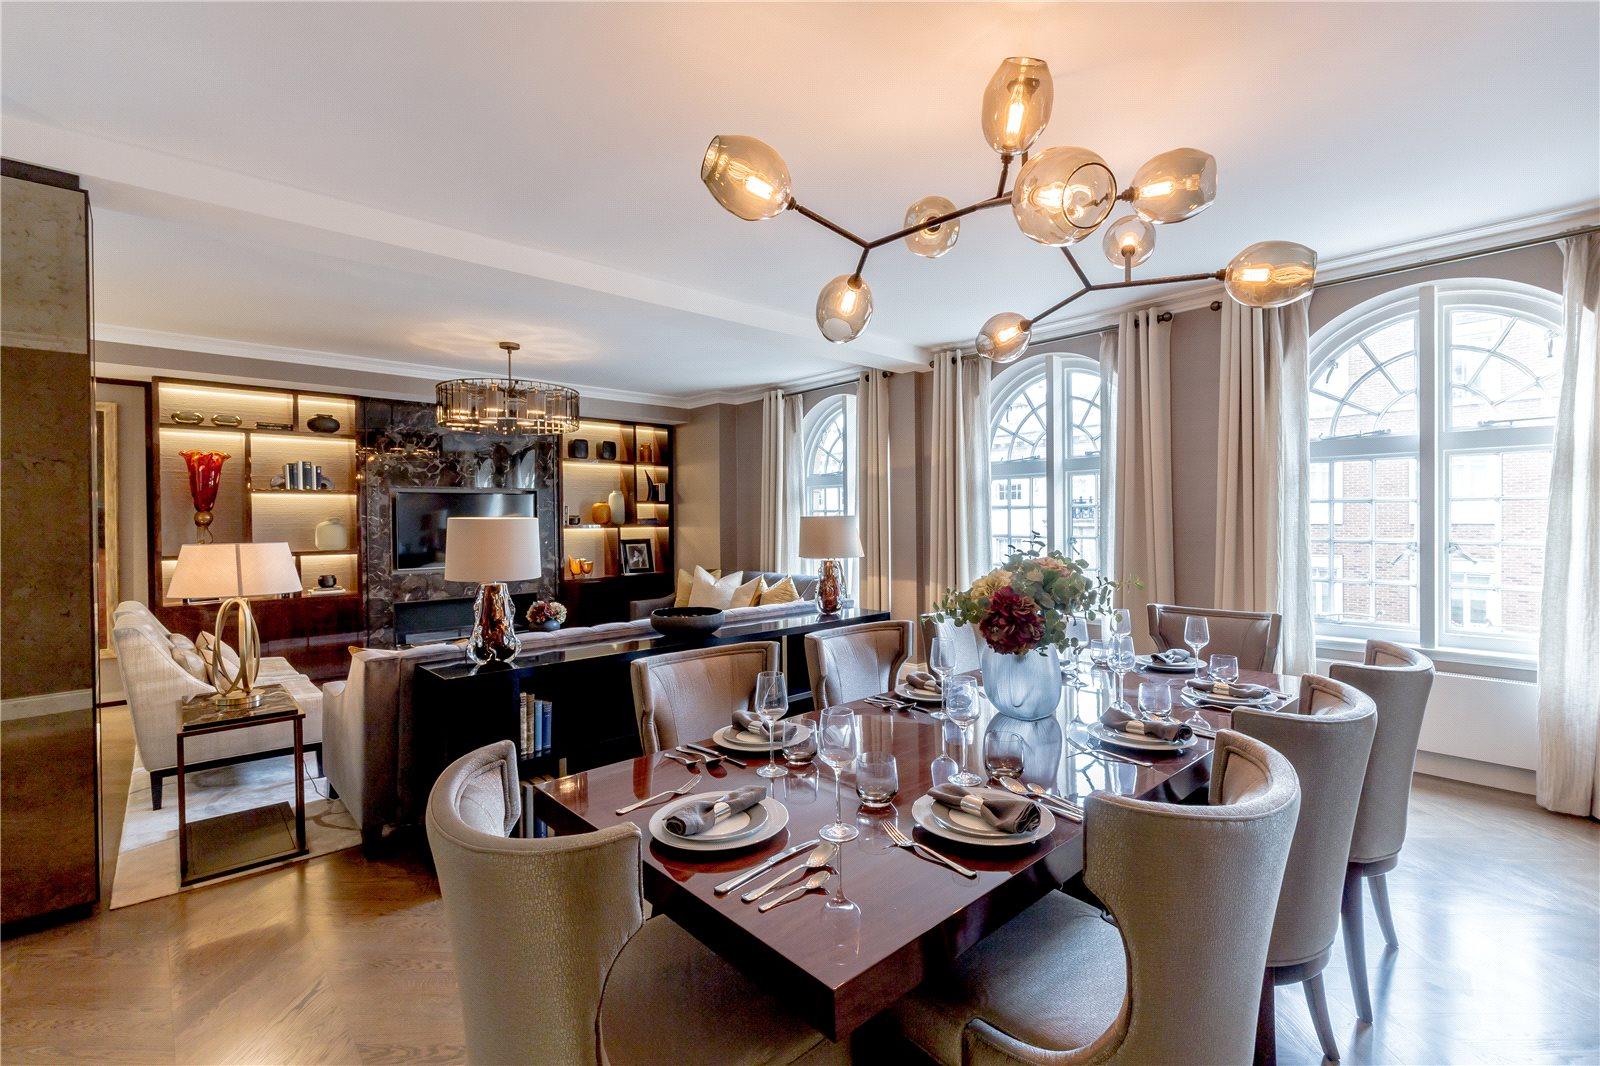 Апартаменты / Квартиры для того Продажа на Hugo House, 177 Sloane Street, London, SW1X London, Англия